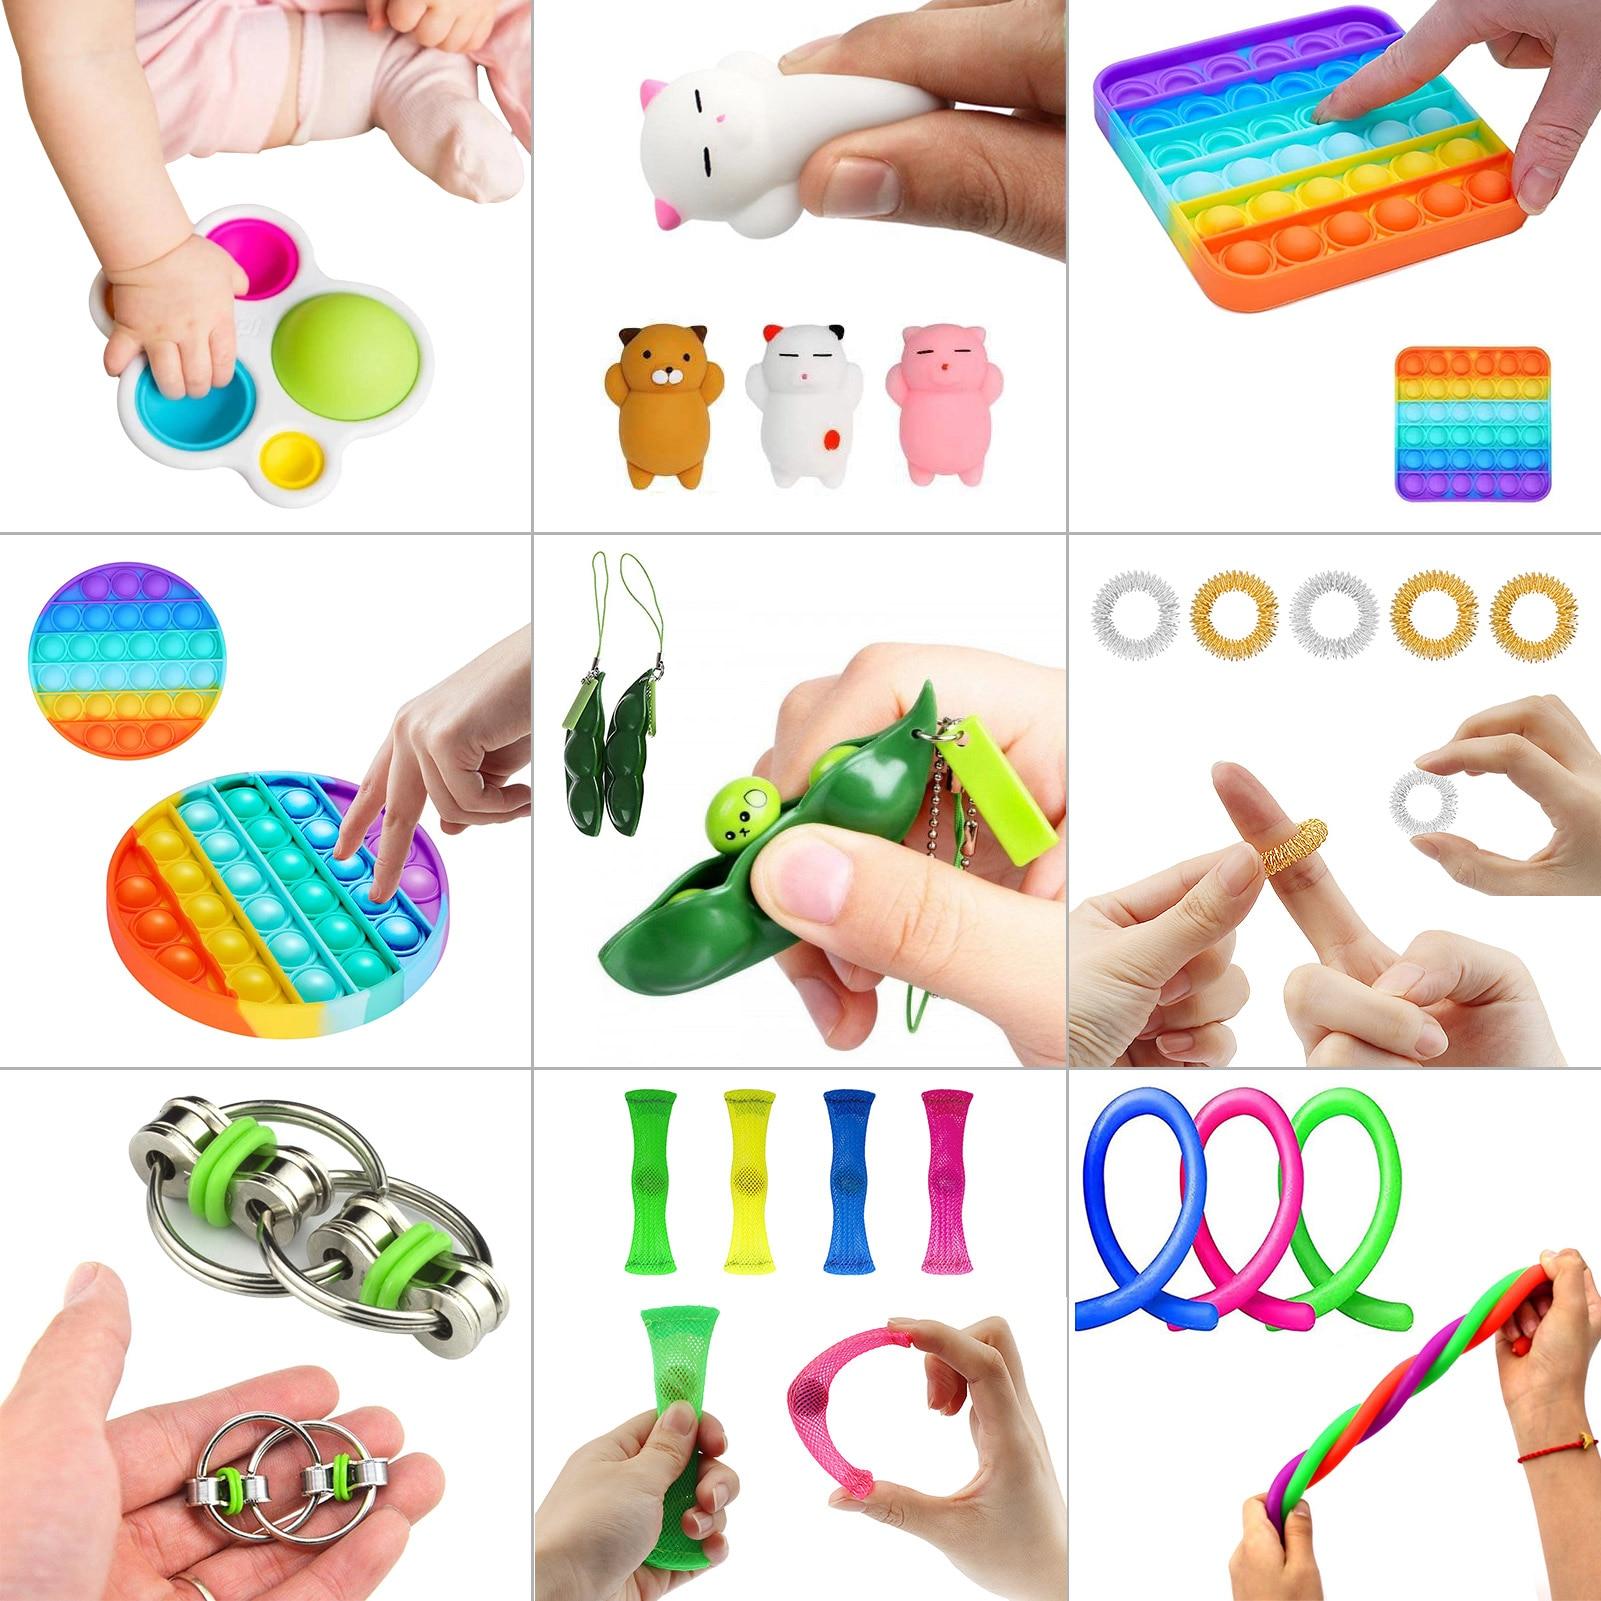 23PCS Sensory Toy Set Push Pop Bubble Fidget Toys for Adult Kids Anti-stress Popit Hand Toys Decompression Stress Reliever Toy enlarge